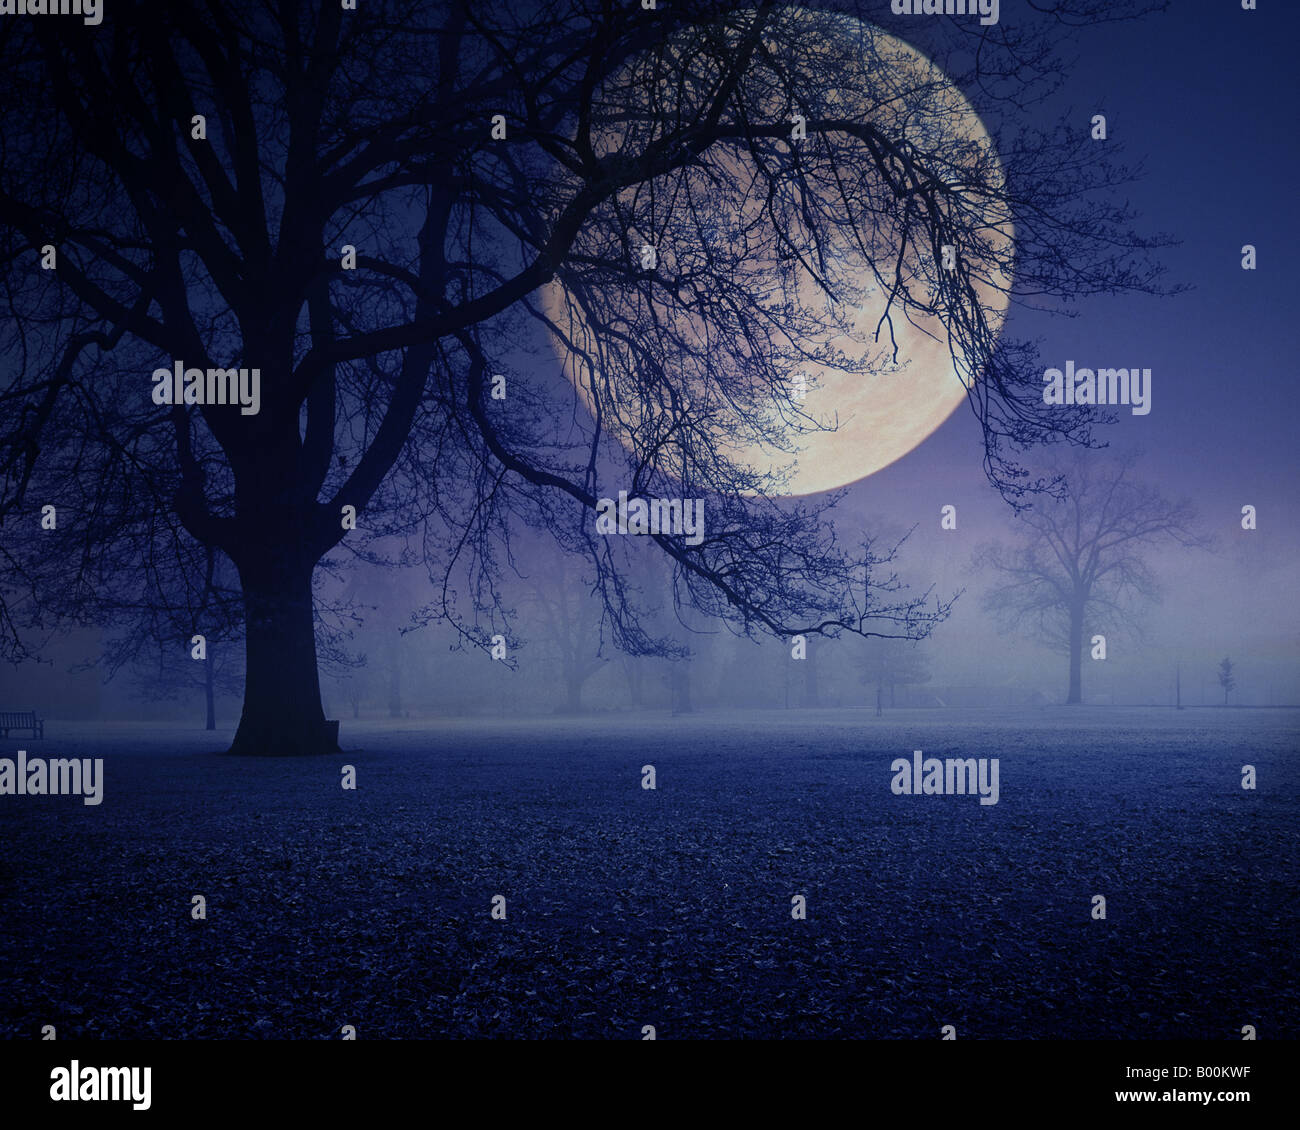 GB - GLOUCESTERSHIRE: Mondnacht in Cheltenham Pittville Park Stockbild